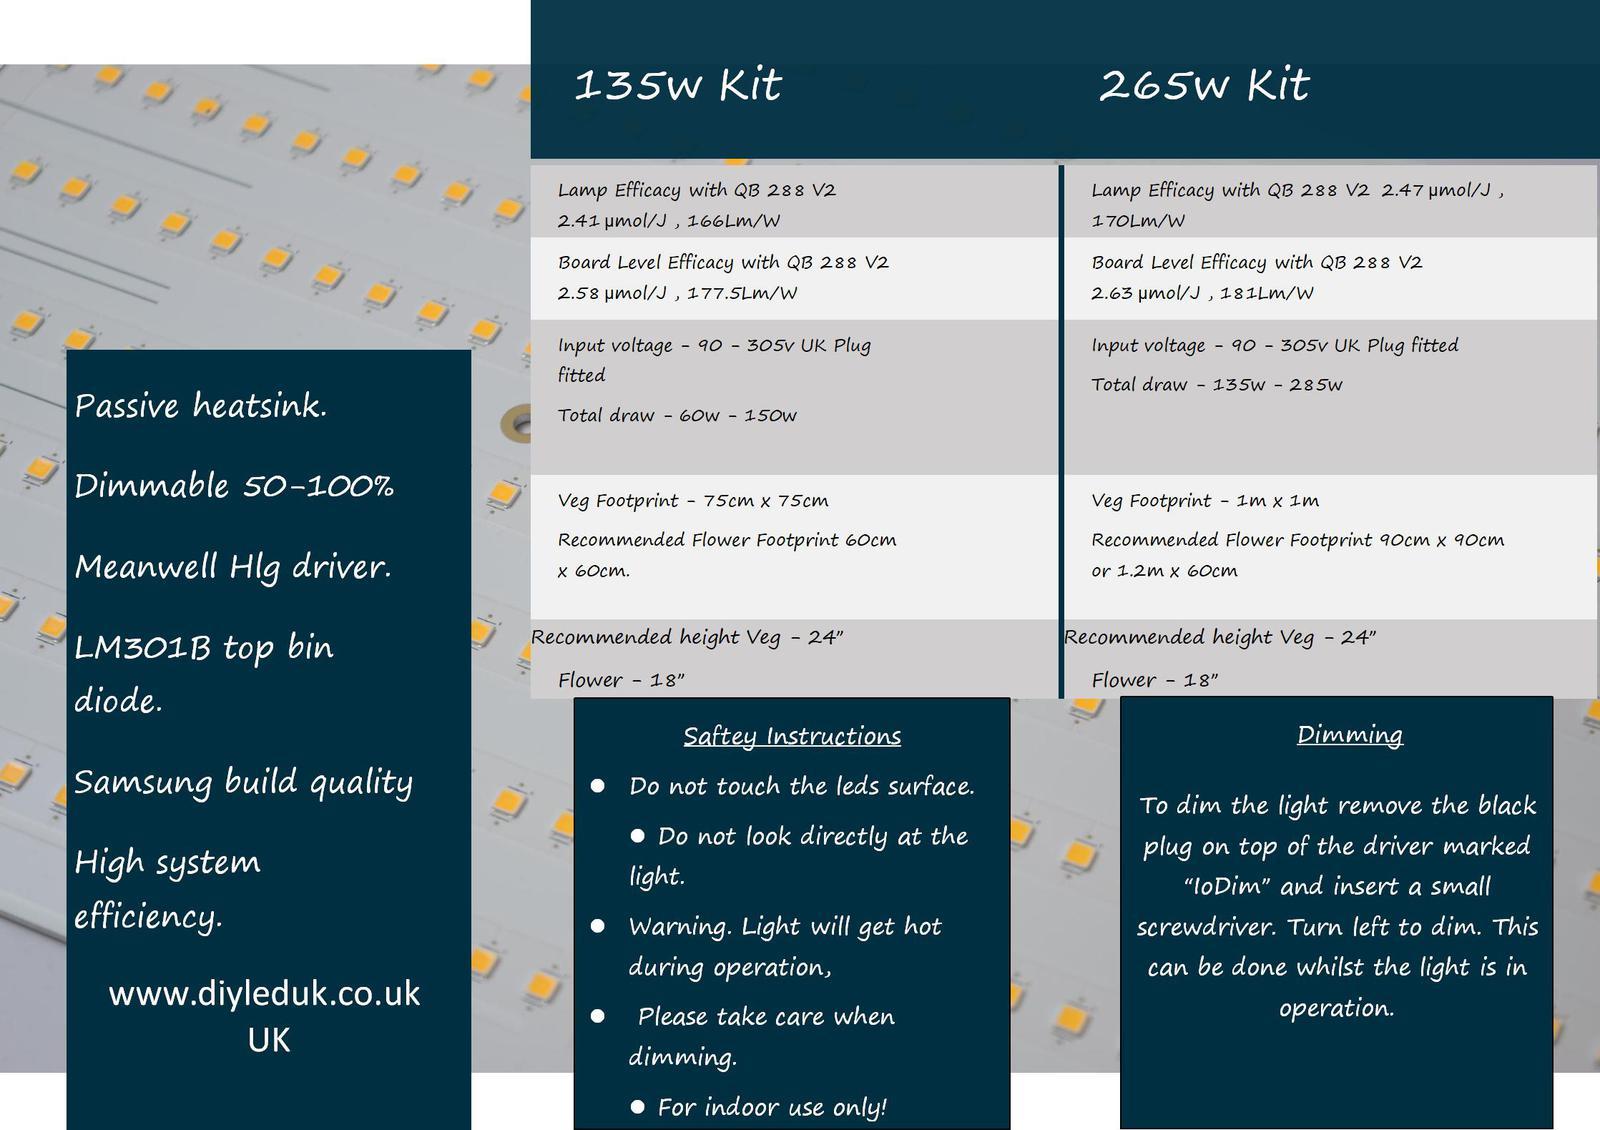 Qb288 V2 Quantum Board Kit